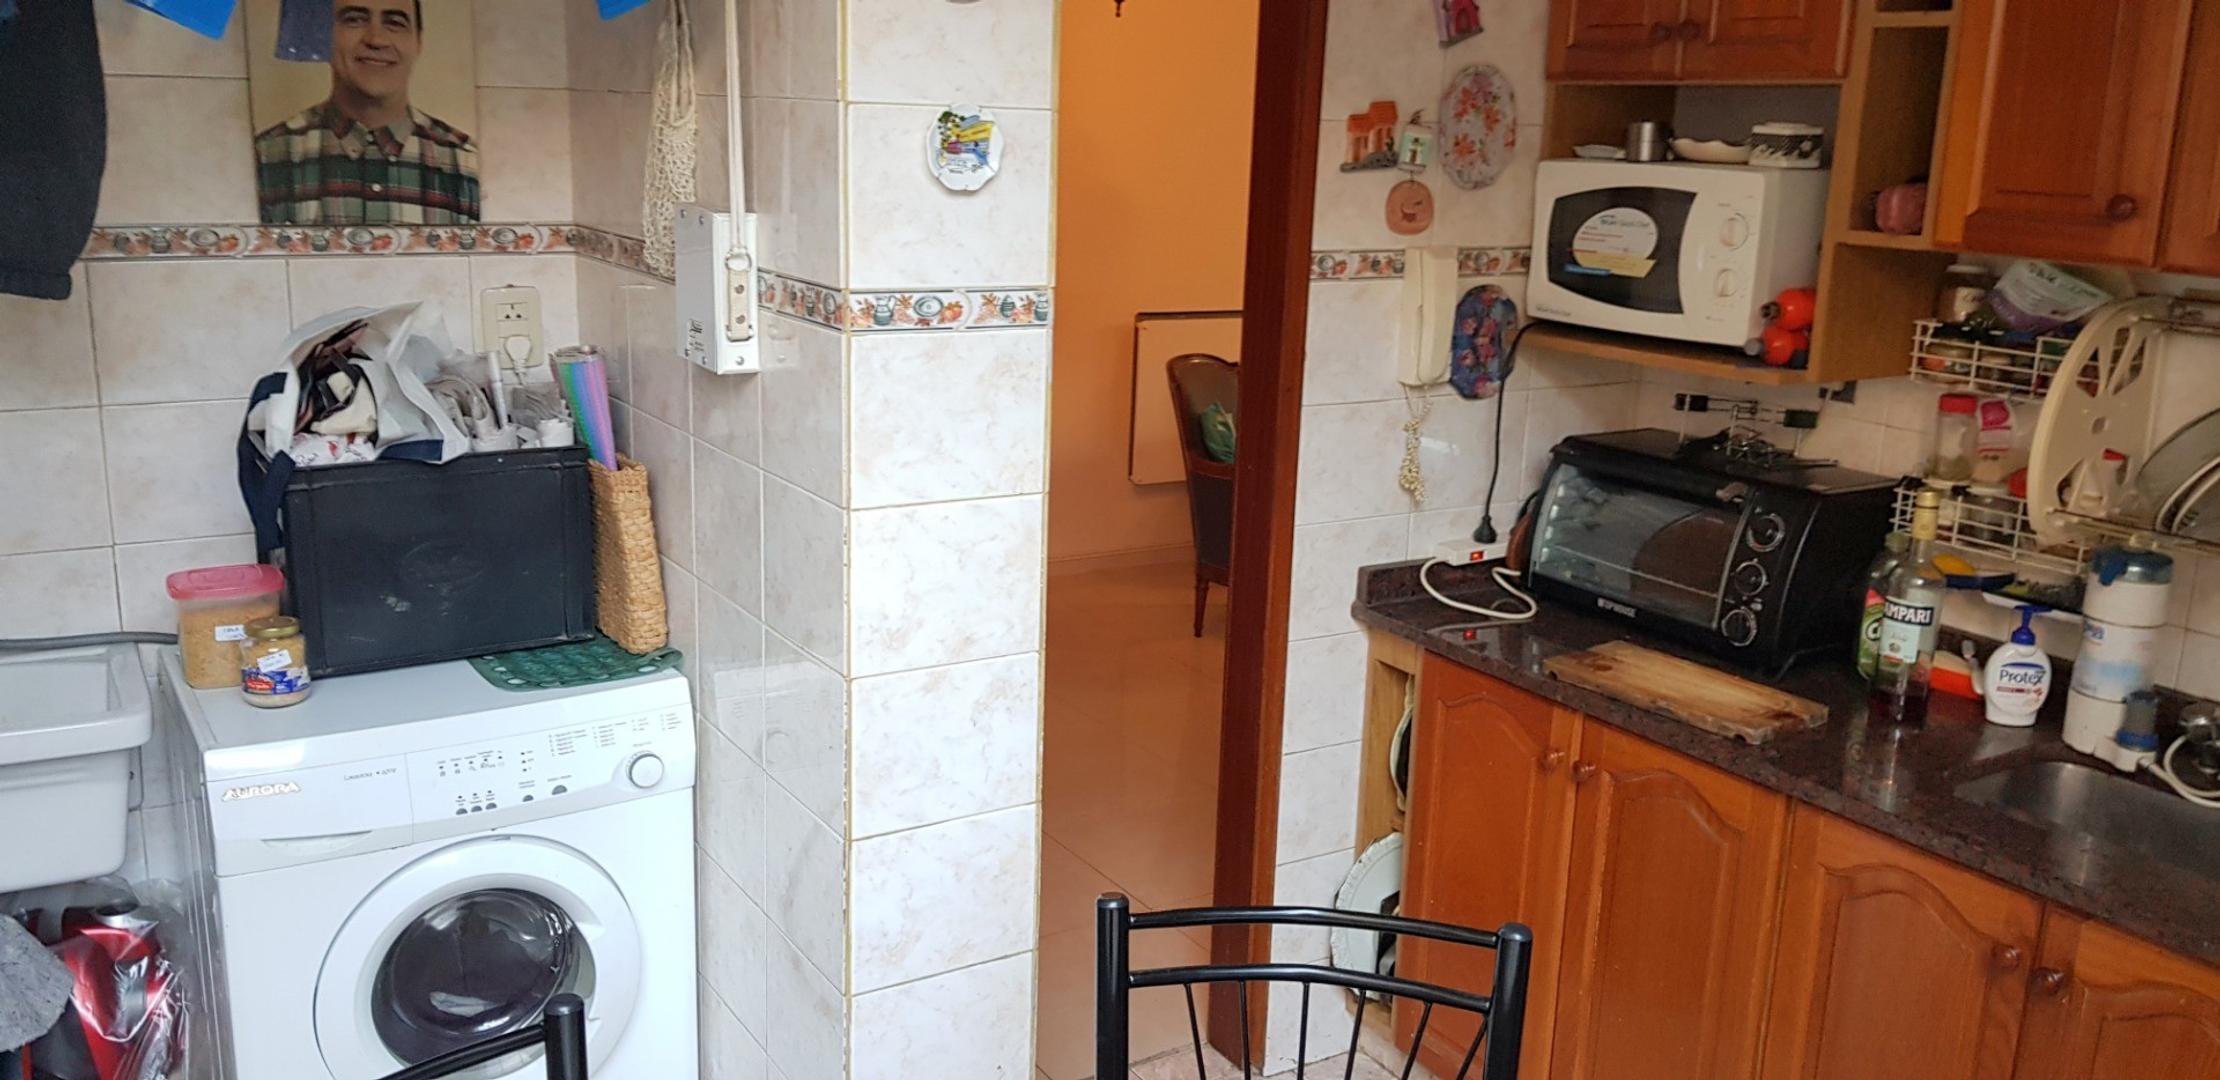 Retasado. Uriarte 2200. Semipiso contrafr. Primer piso. 93 m2. 3 amb. 2 dorm. Cochera. Reciclado - Foto 15